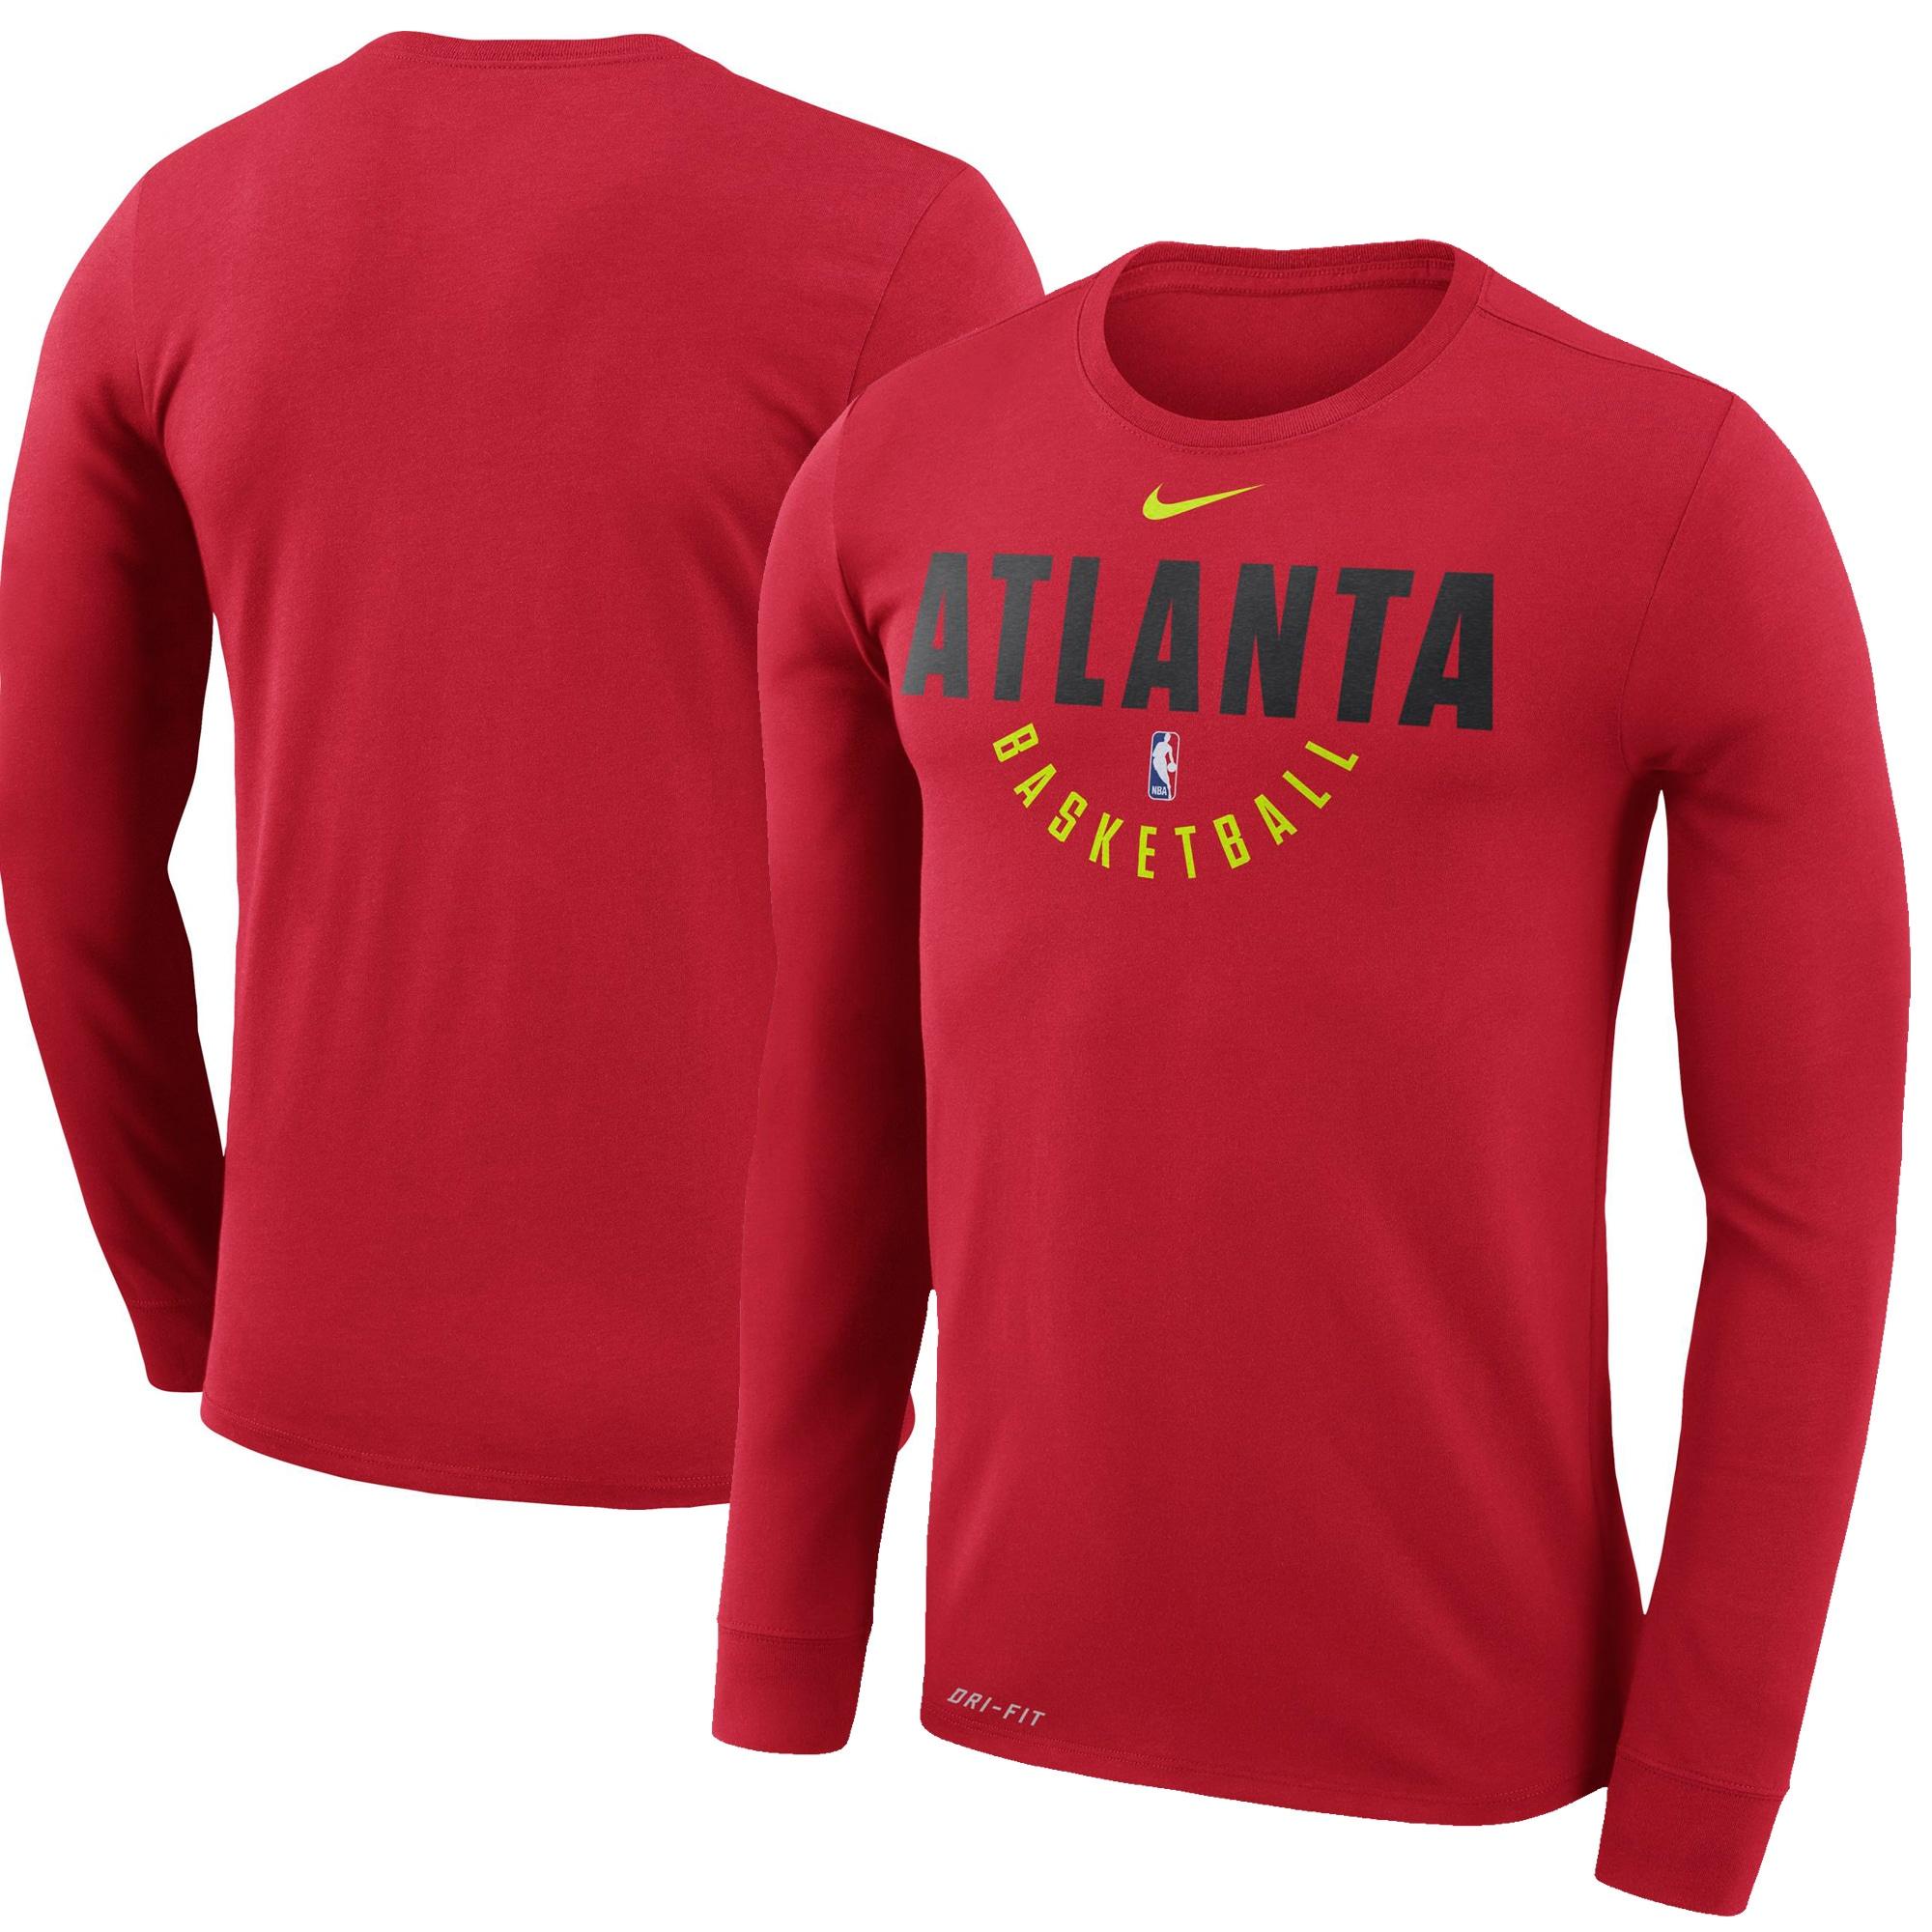 Atlanta Hawks Nike Practice Long Sleeve Performance T-Shirt - Red